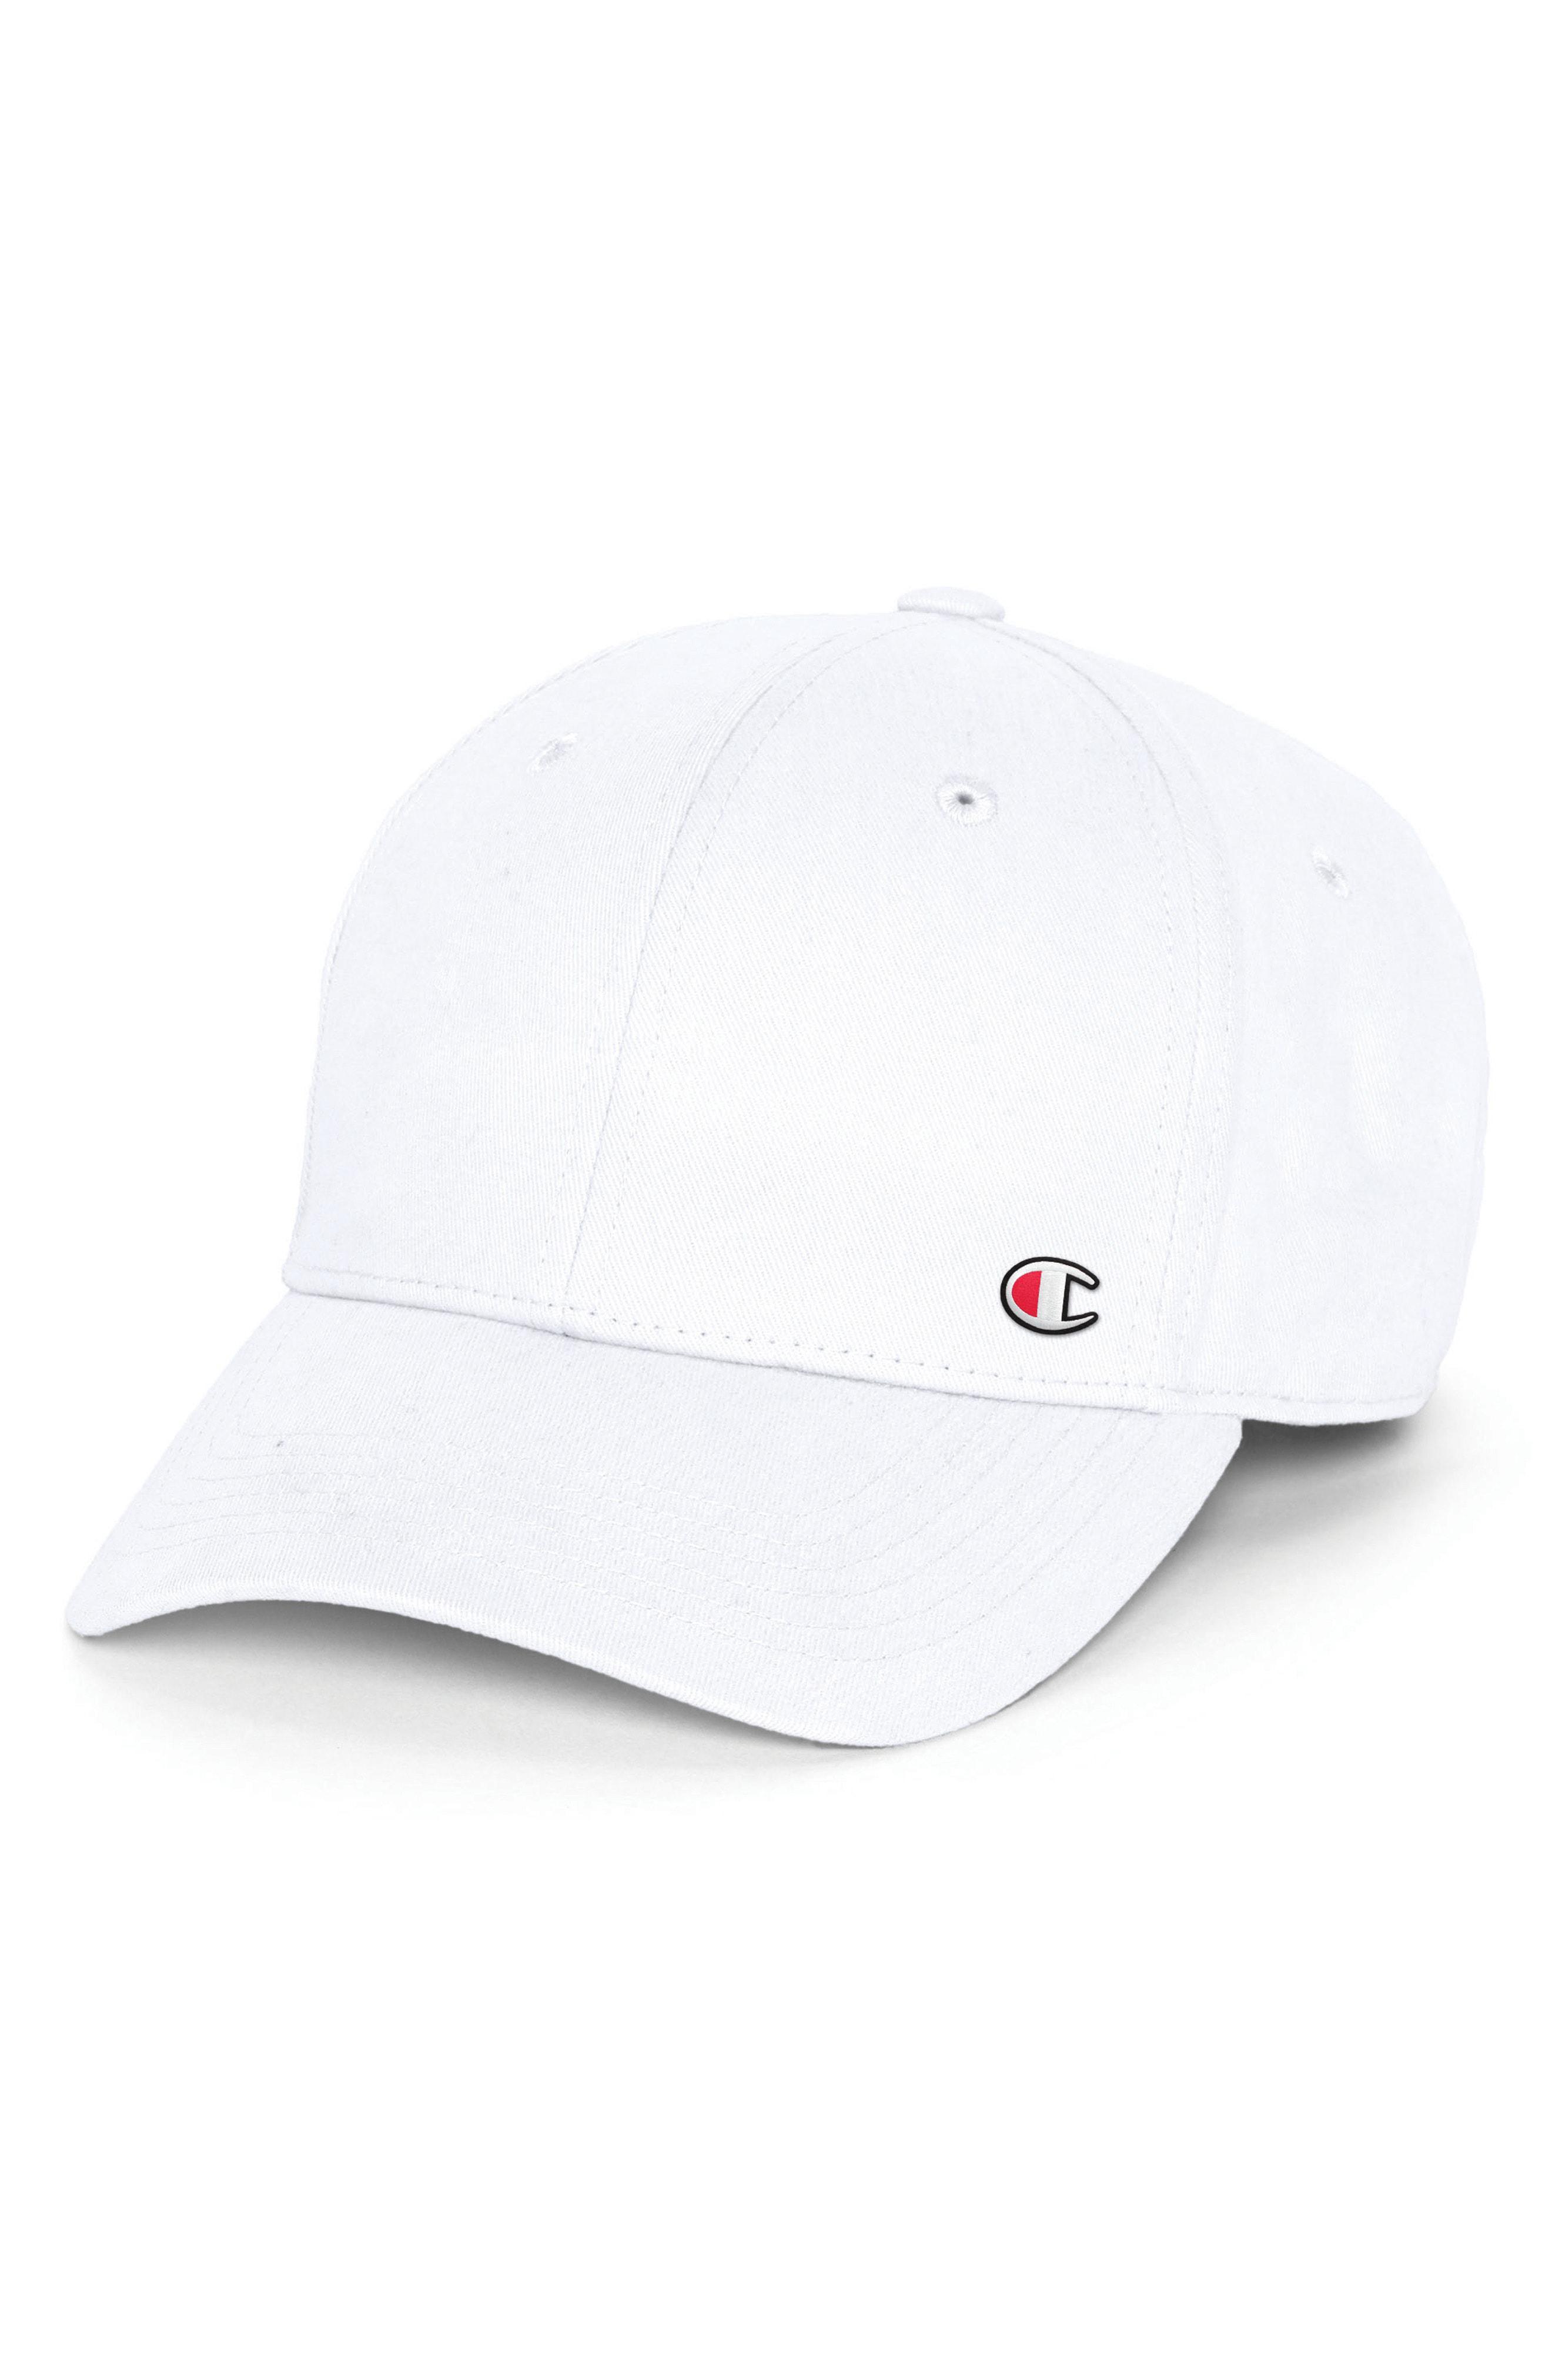 6f08d4fa9b6bd ... usa lyst champion classic twill c patch ball cap in white for men 0e750  55d21 ...